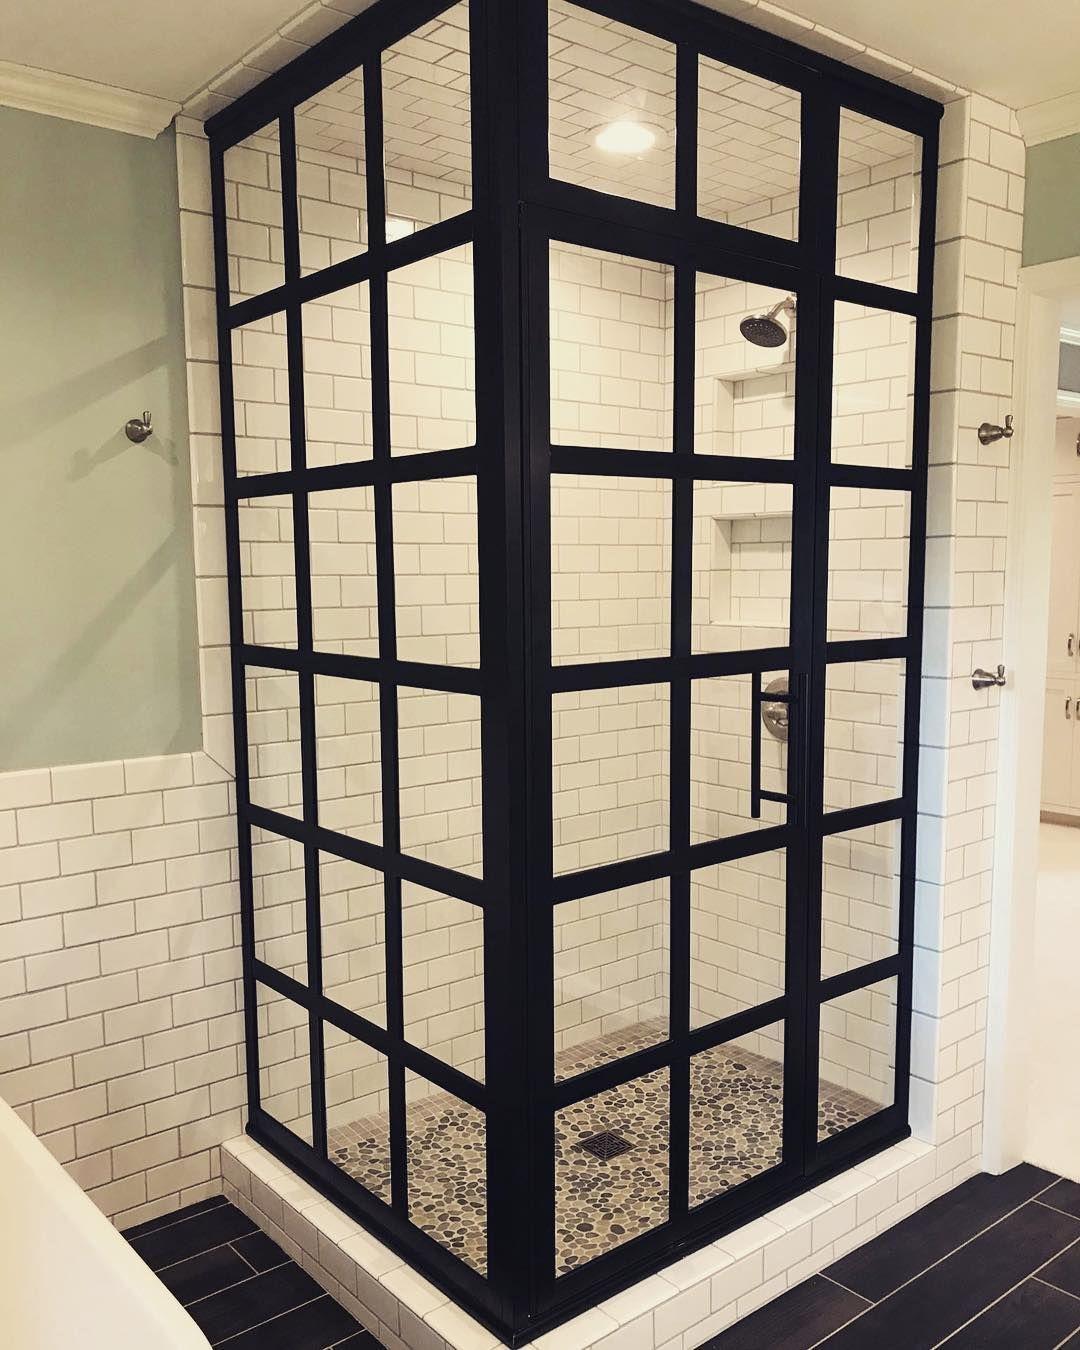 Gridscape Series 1 True Divided Light Factory Window Shower By Coastal Shower  Doors Omni Glass U0026 Paint (@omniglasspaint) On Instagram: U201cWe Canu0027t Get  Enough ...